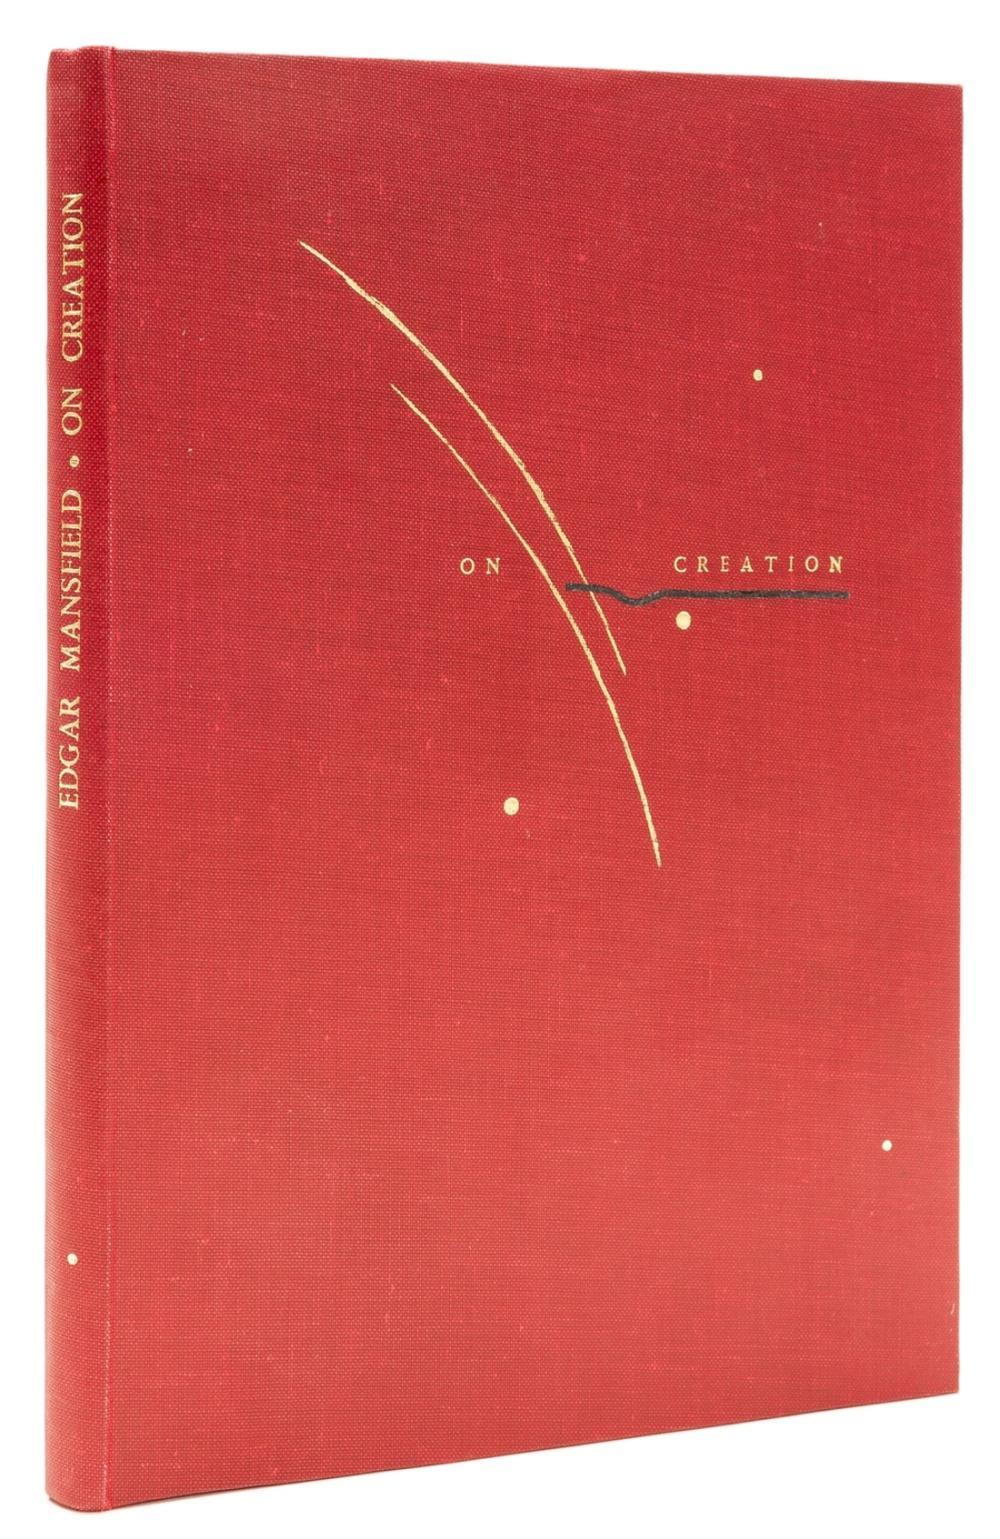 Corbett (Judy, binder).- Mansfield (Edgar) On Creation, one of 150 copies, Eastbourne, Hawk Press, 1981.